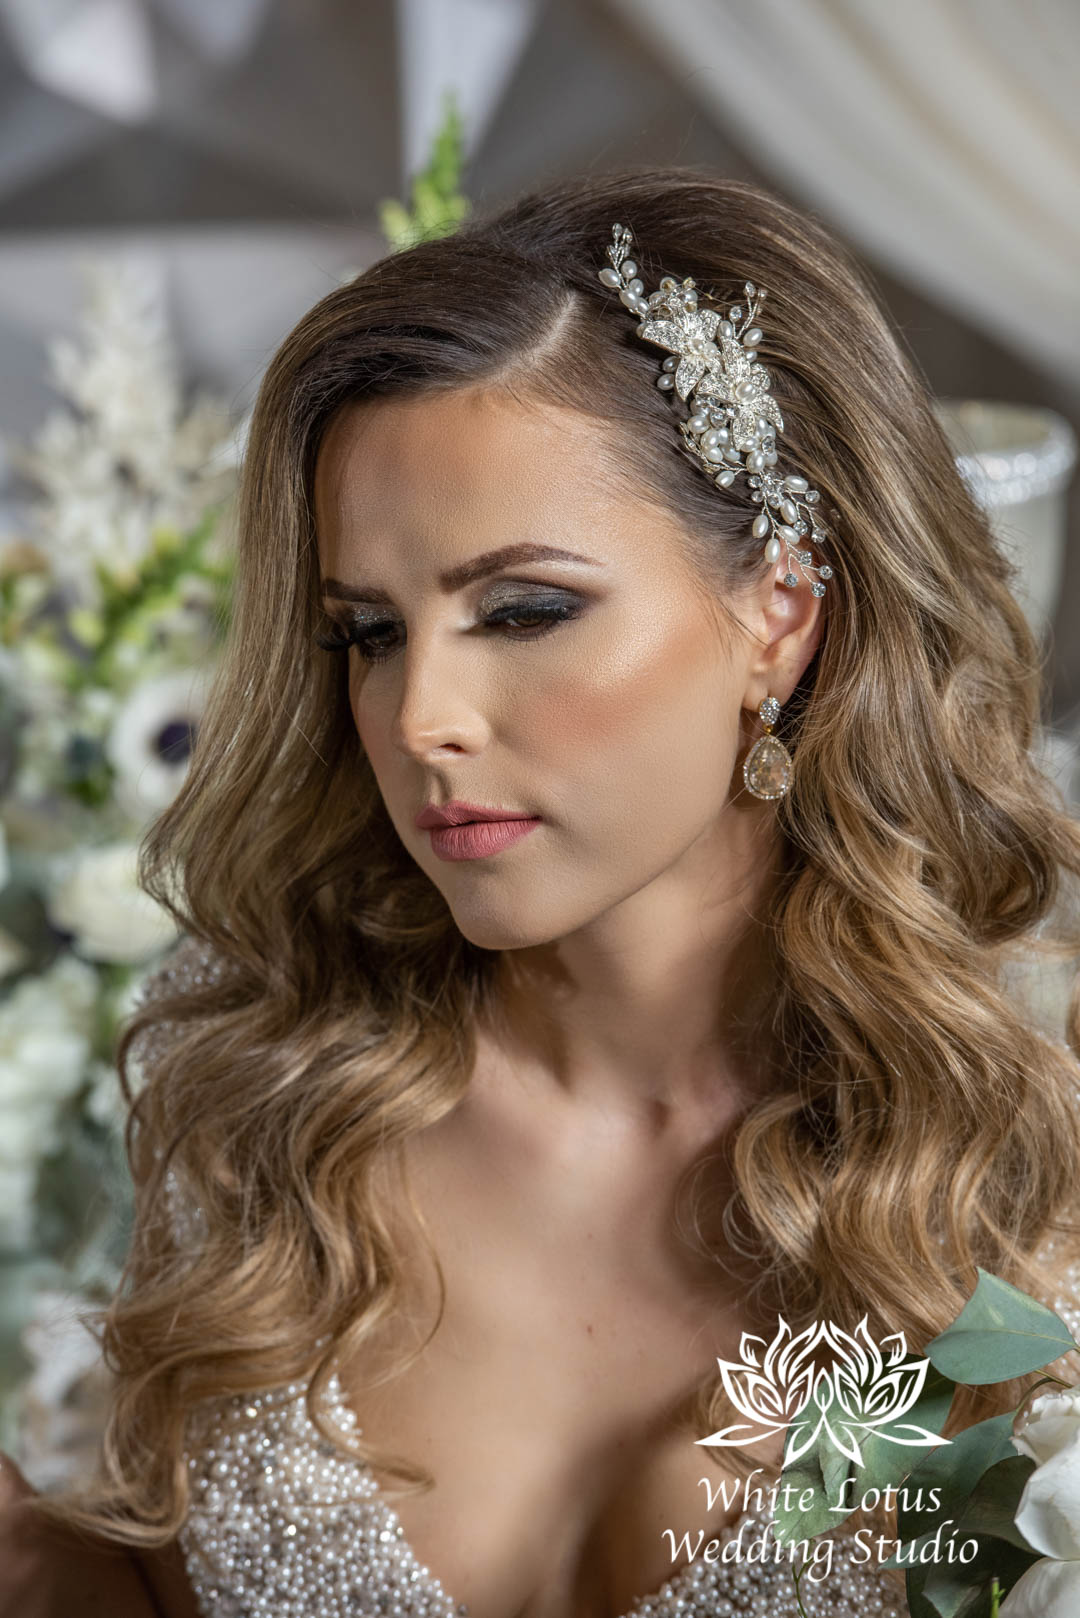 147- GLAM WINTERLUXE WEDDING INSPIRATION